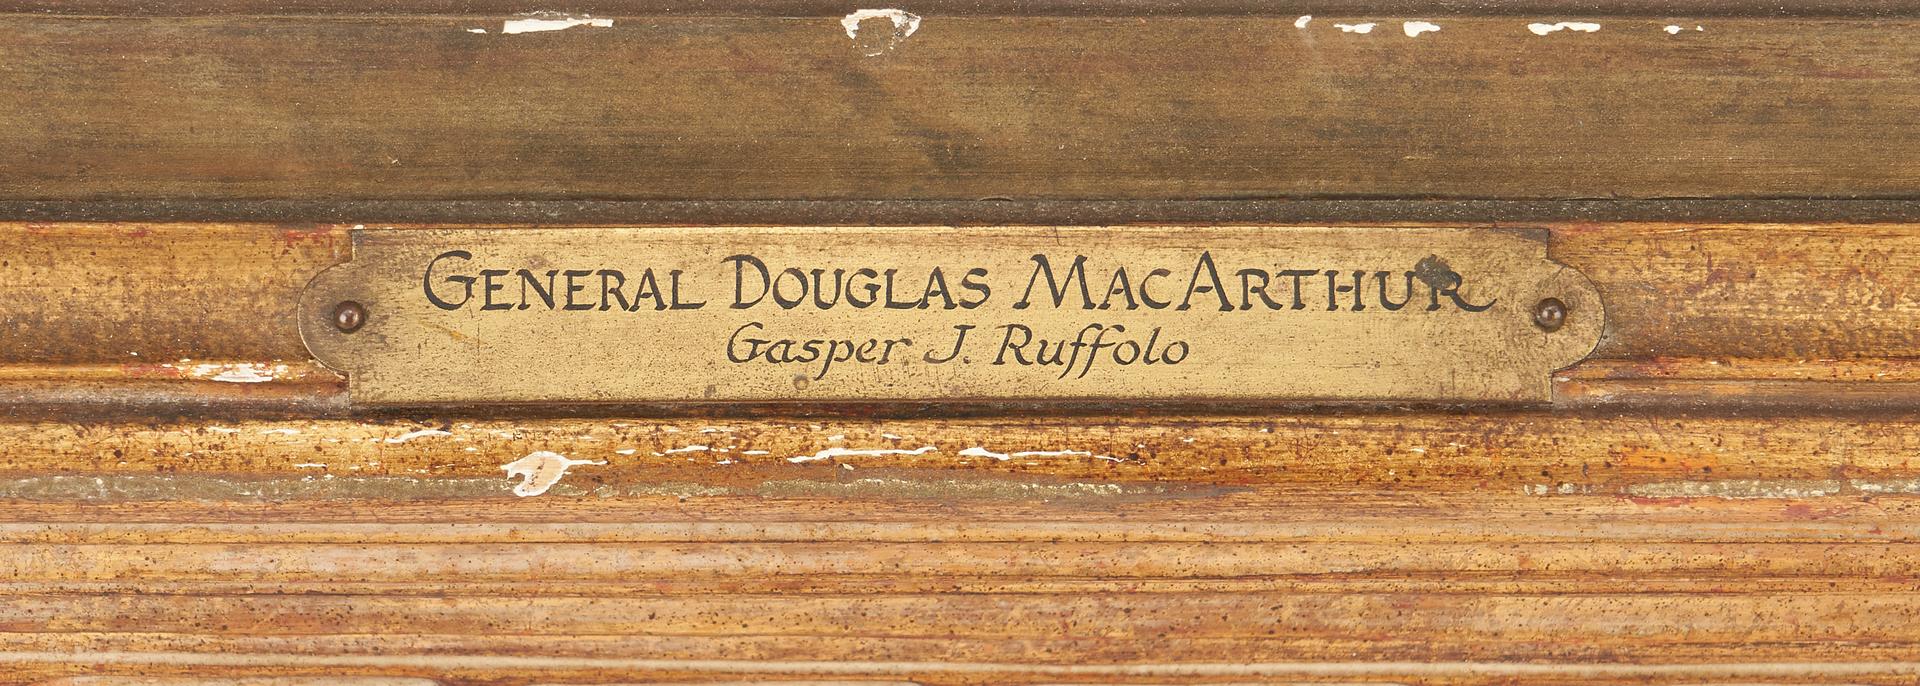 Lot 776: G. Ruffolo Oil on Canvas Portrait of General Douglas MacArthur, 1935